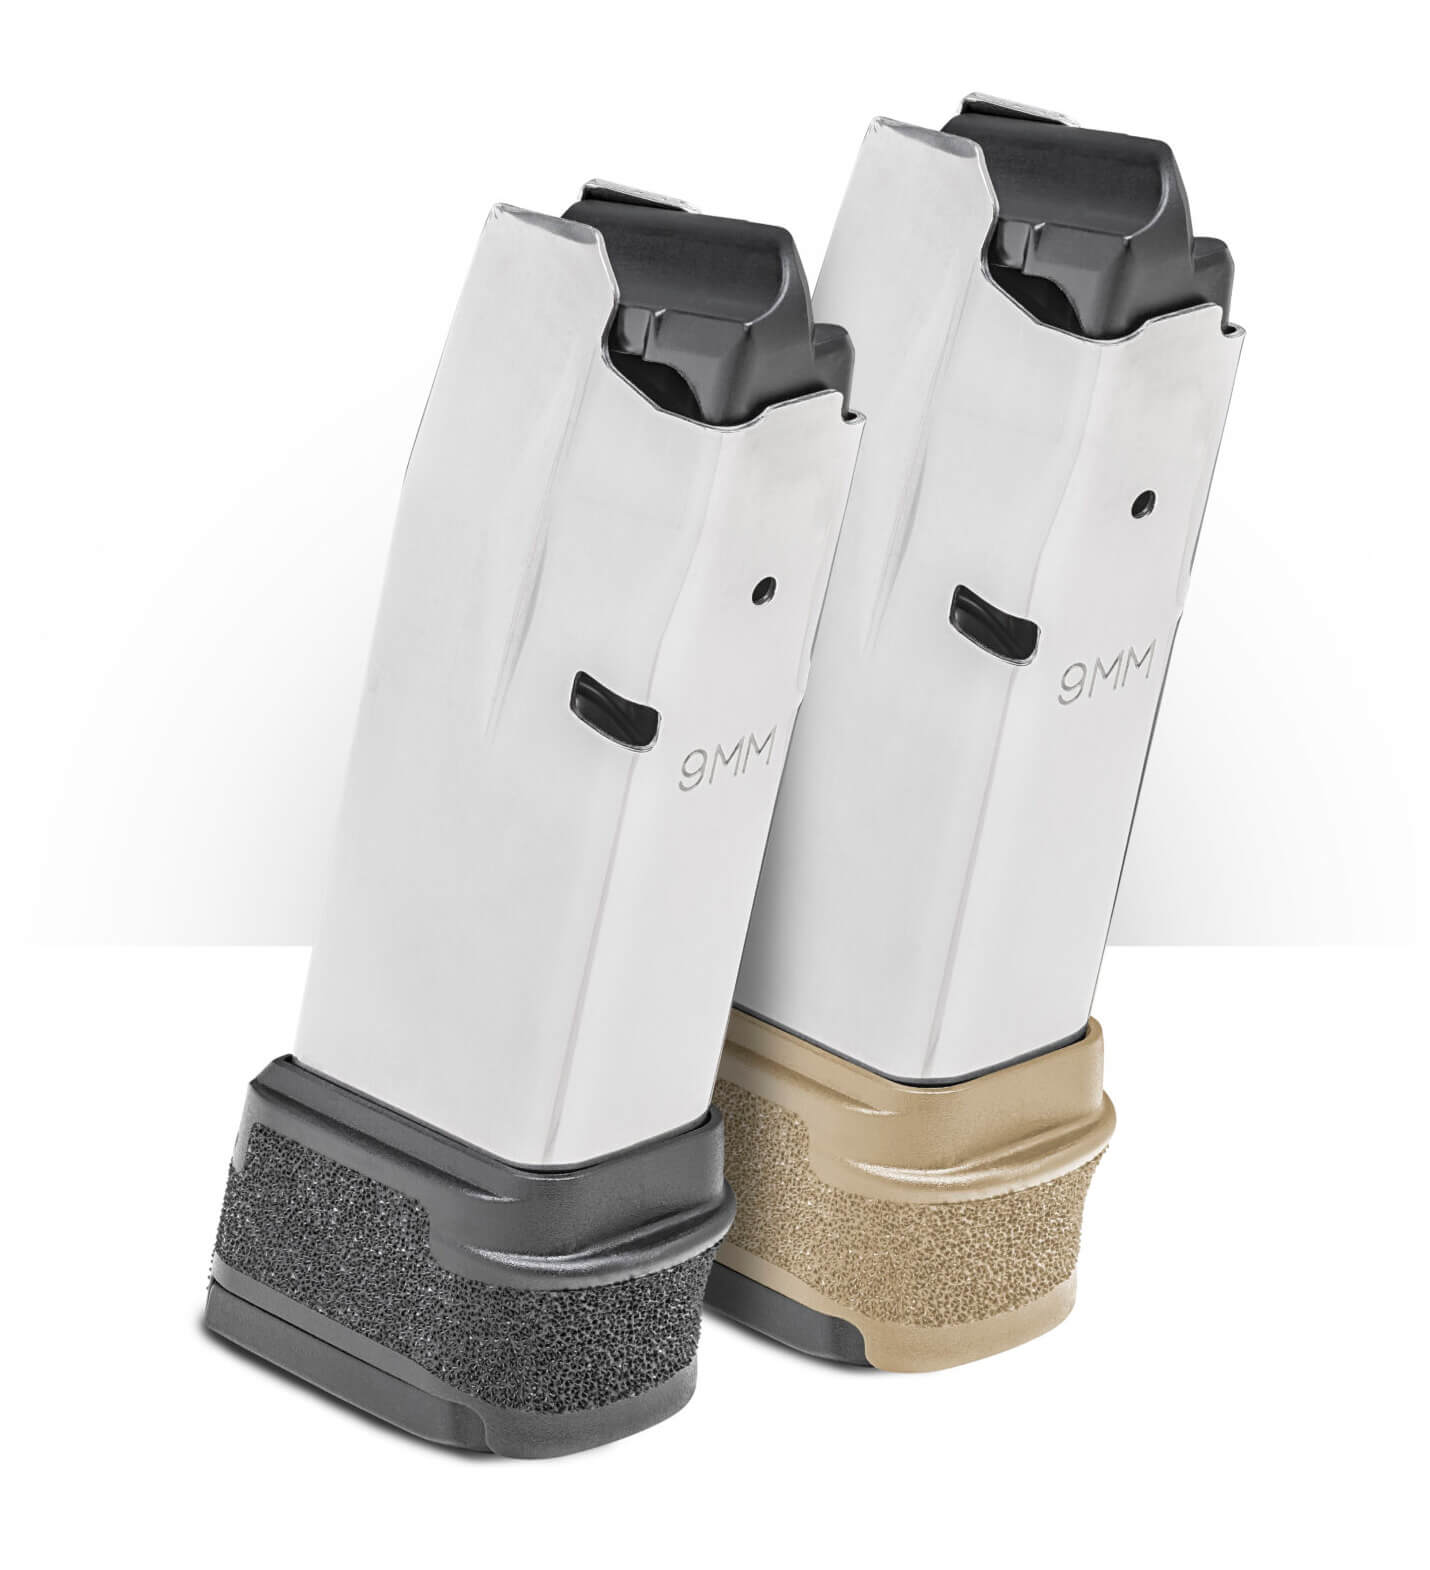 FDE and black magazines for Springfield Hellcat pistol